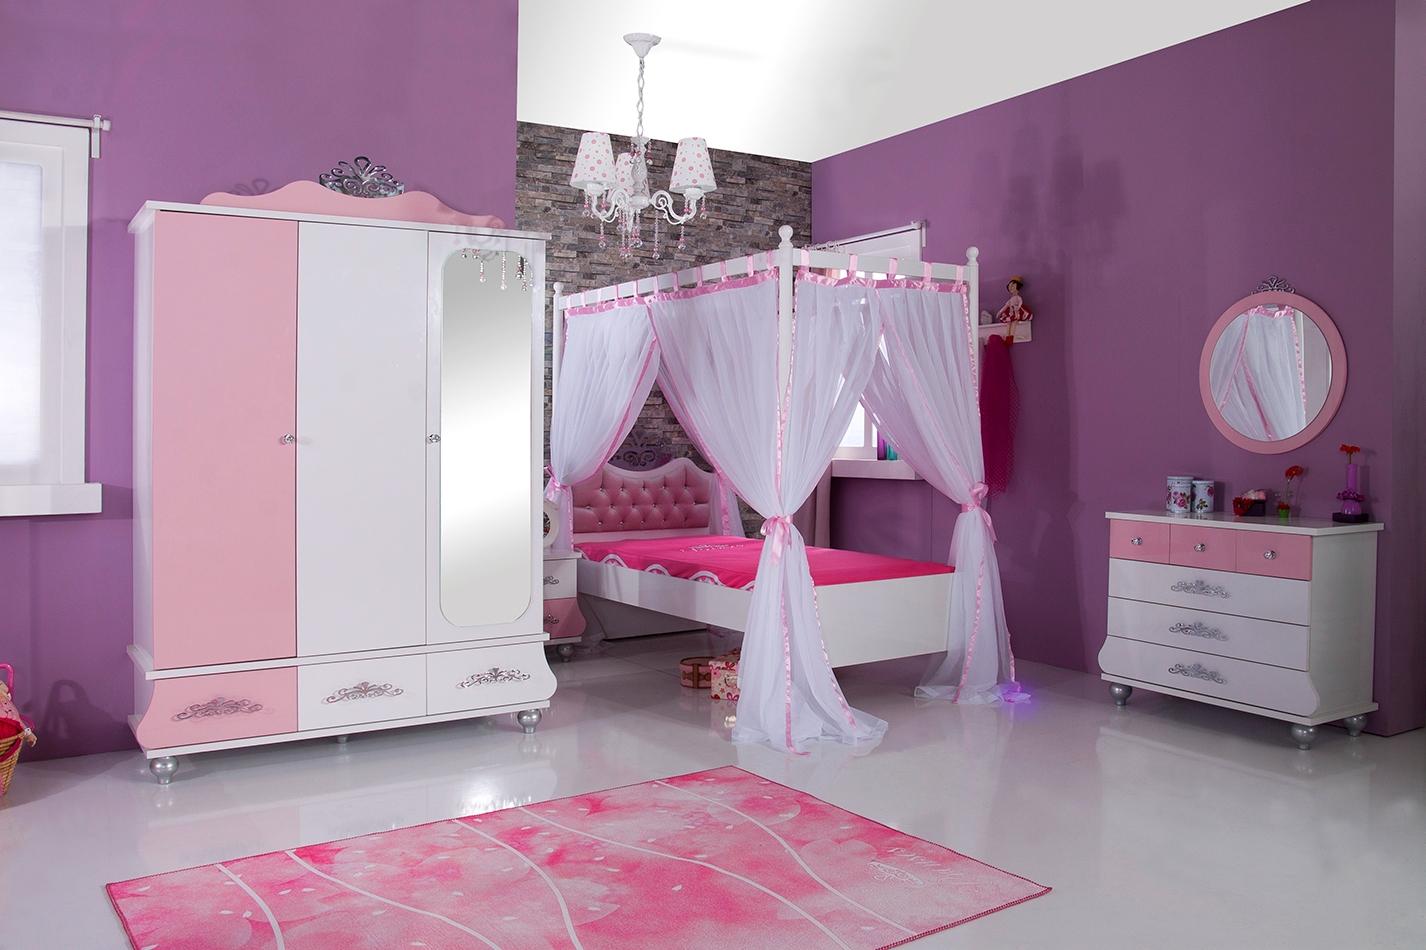 prinsessenkamer_hemelbed